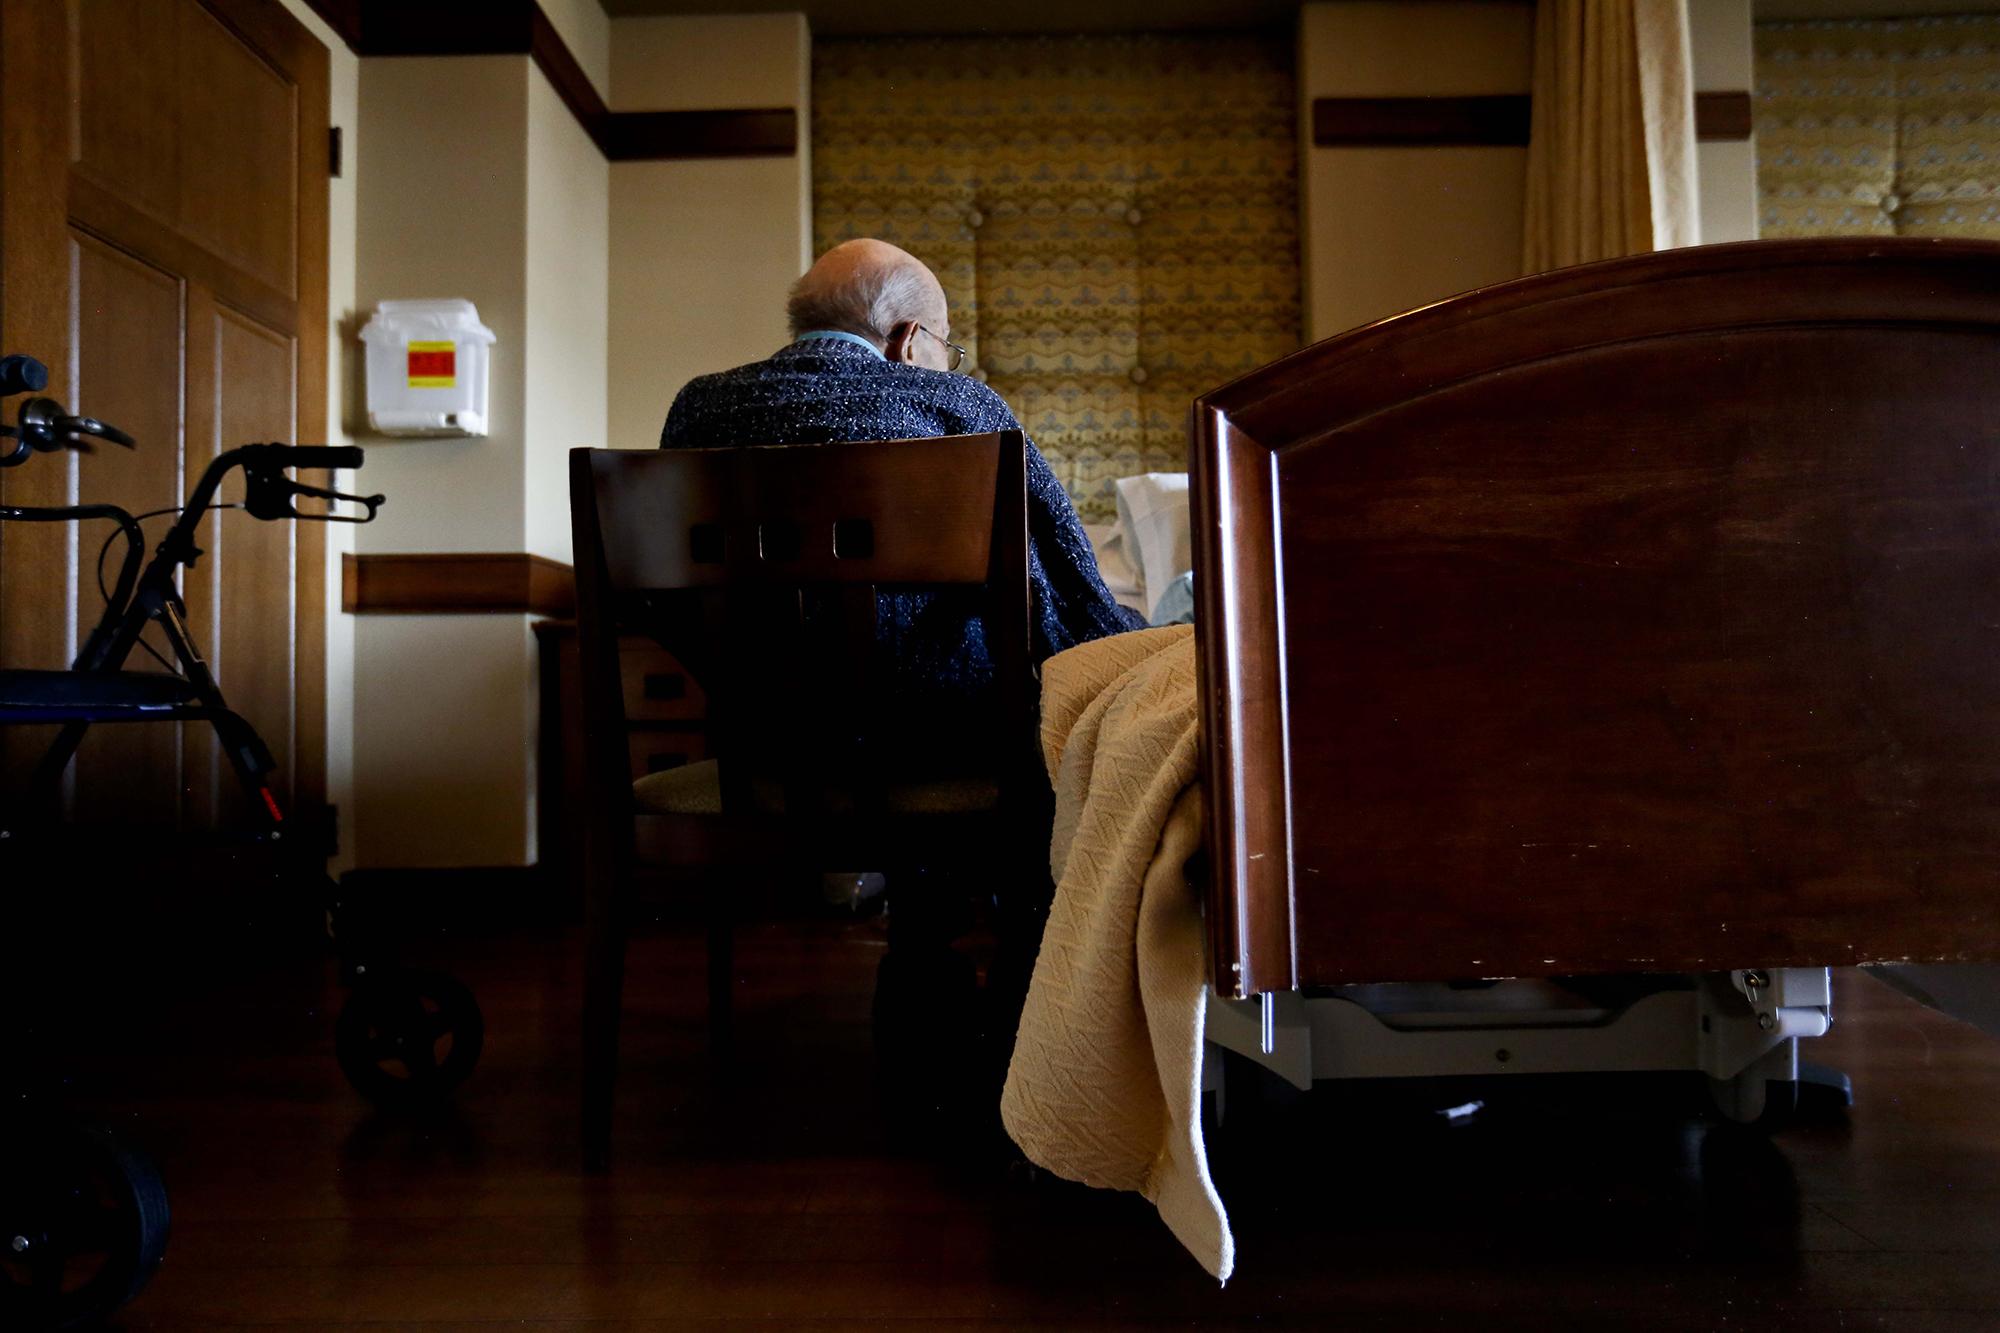 Photo: Joe Doak Hospice Care 1 - Daily Sentinel